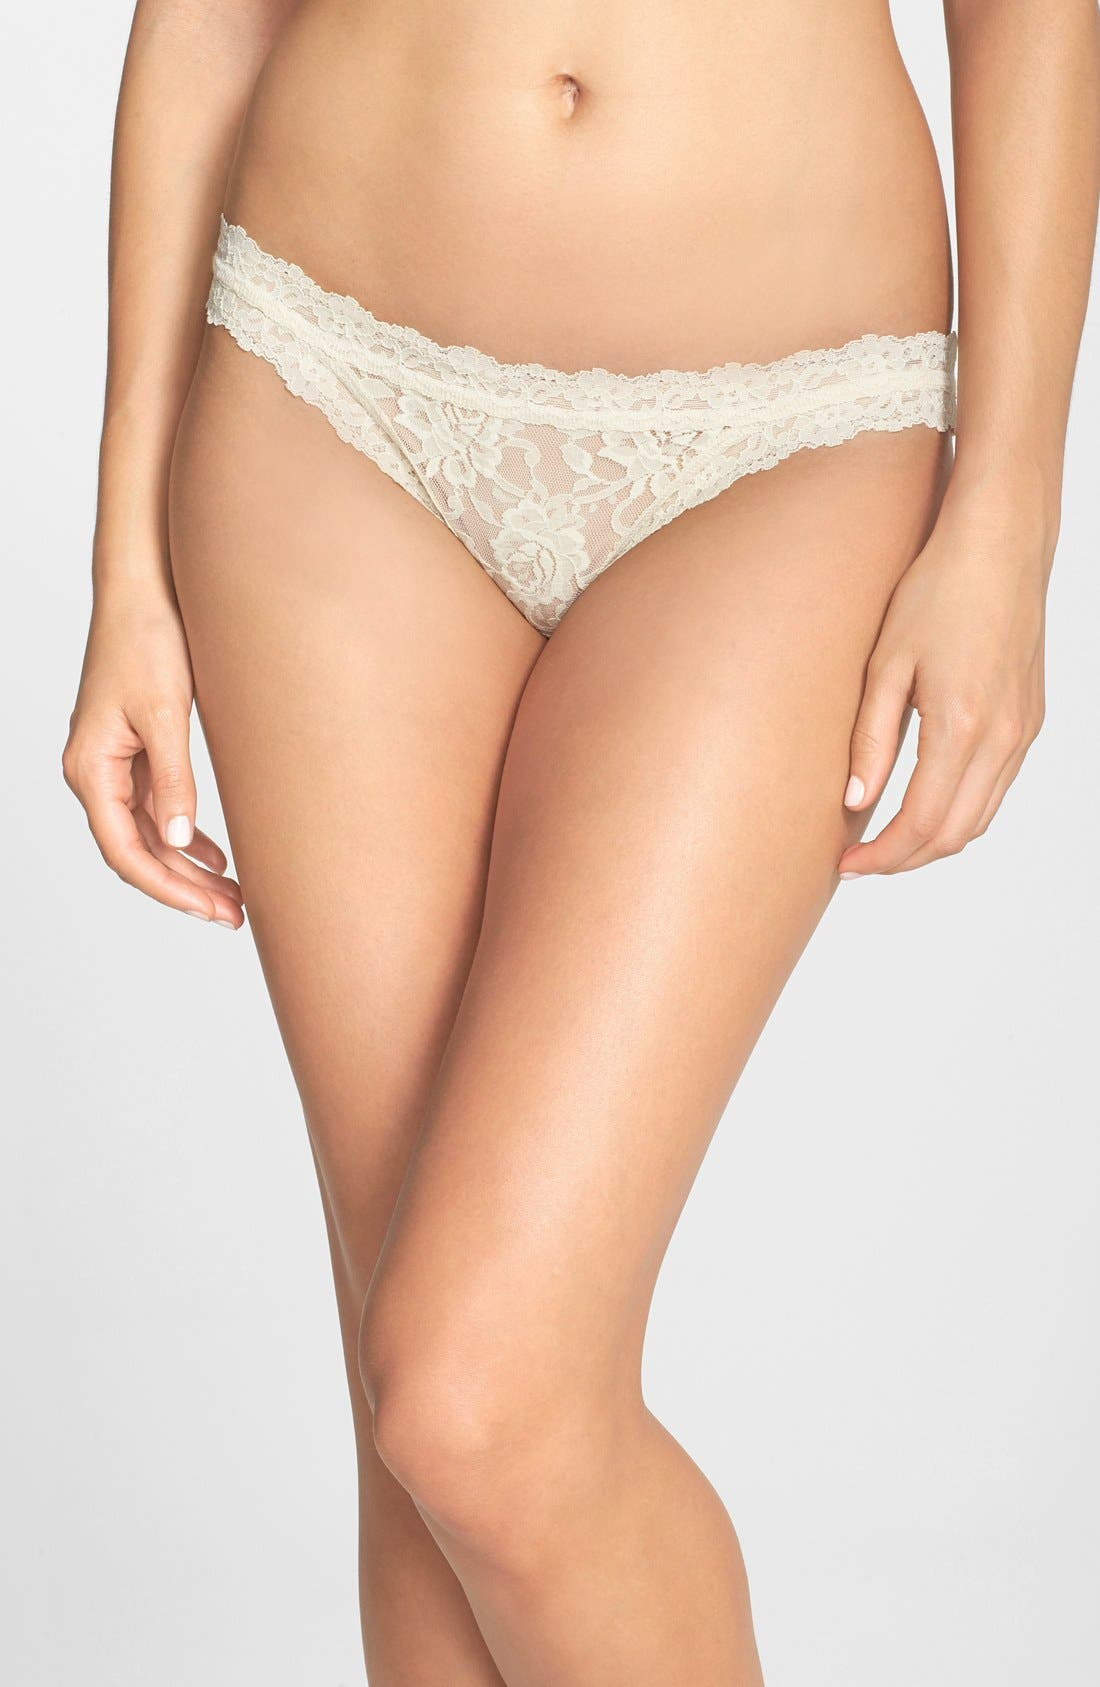 Alternate Image 1 Selected - Hanky Panky 'Signature Lace' Brazilian Bikini